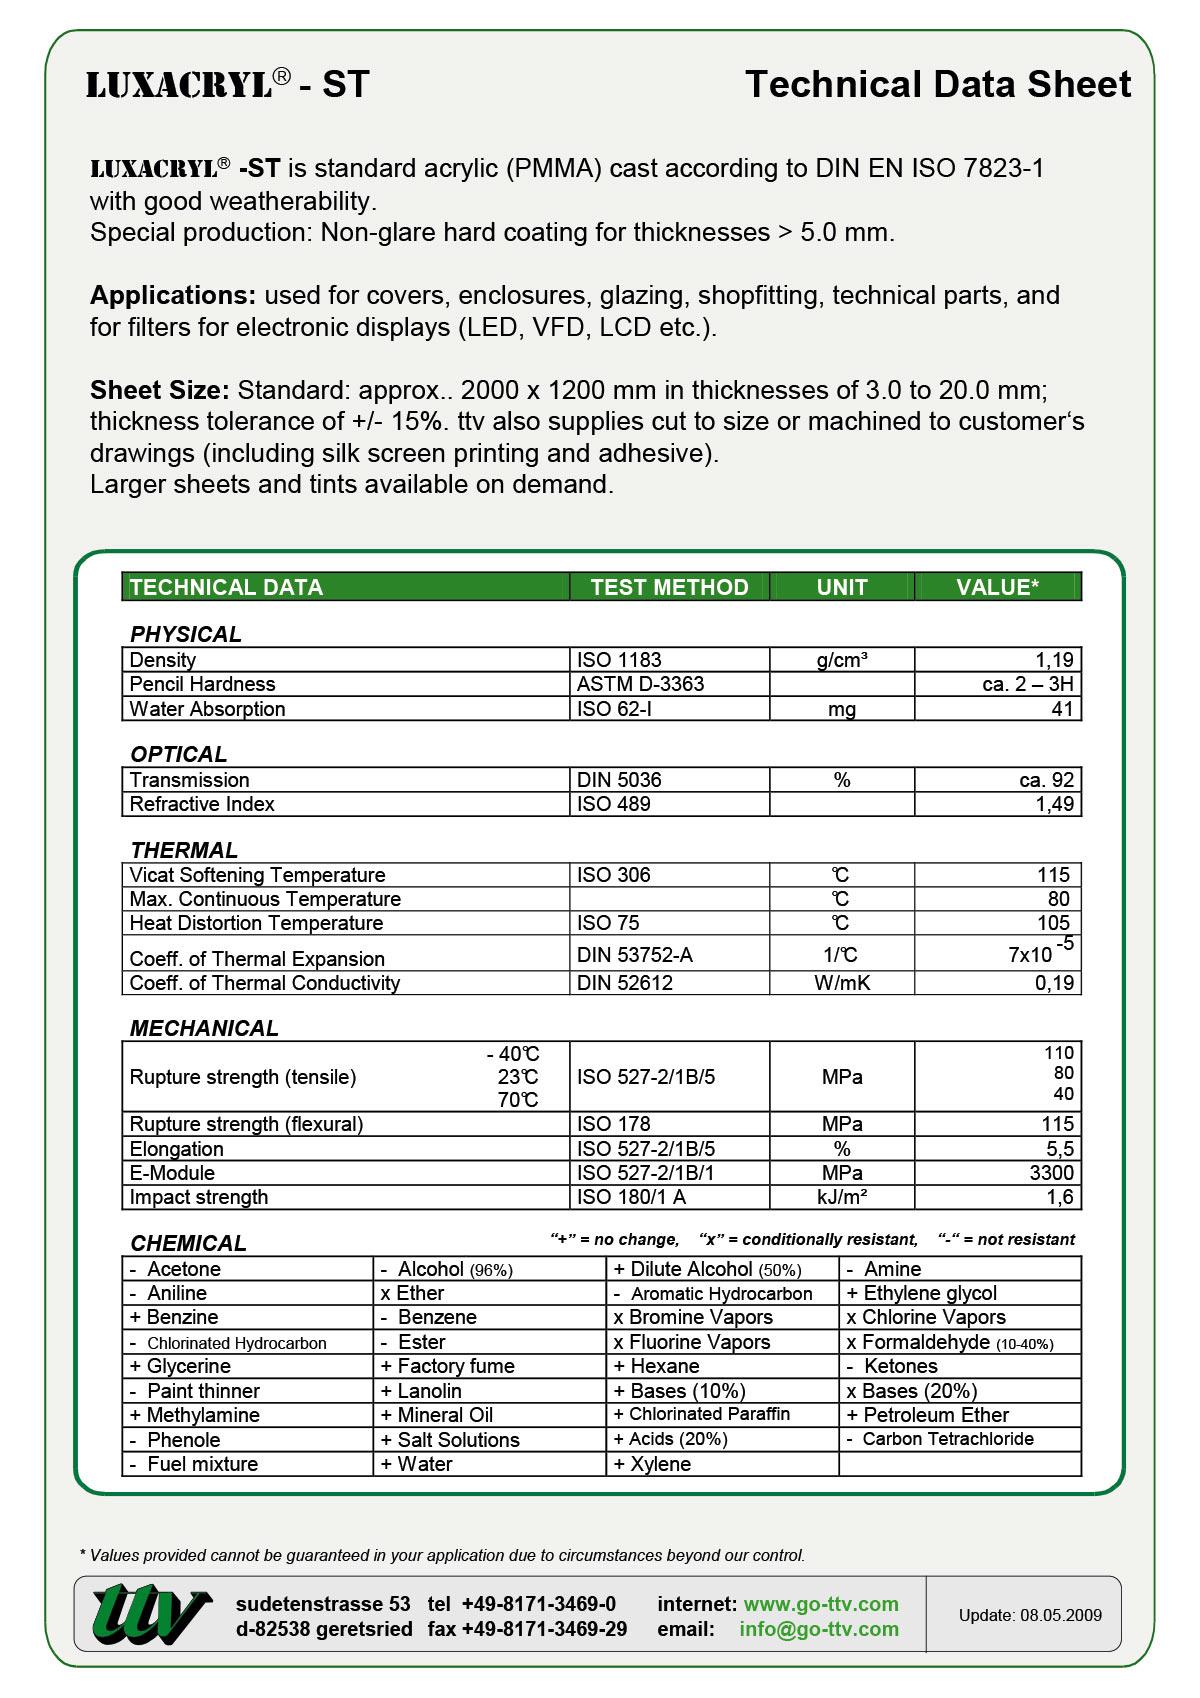 Luxacryl-ST Data sheet